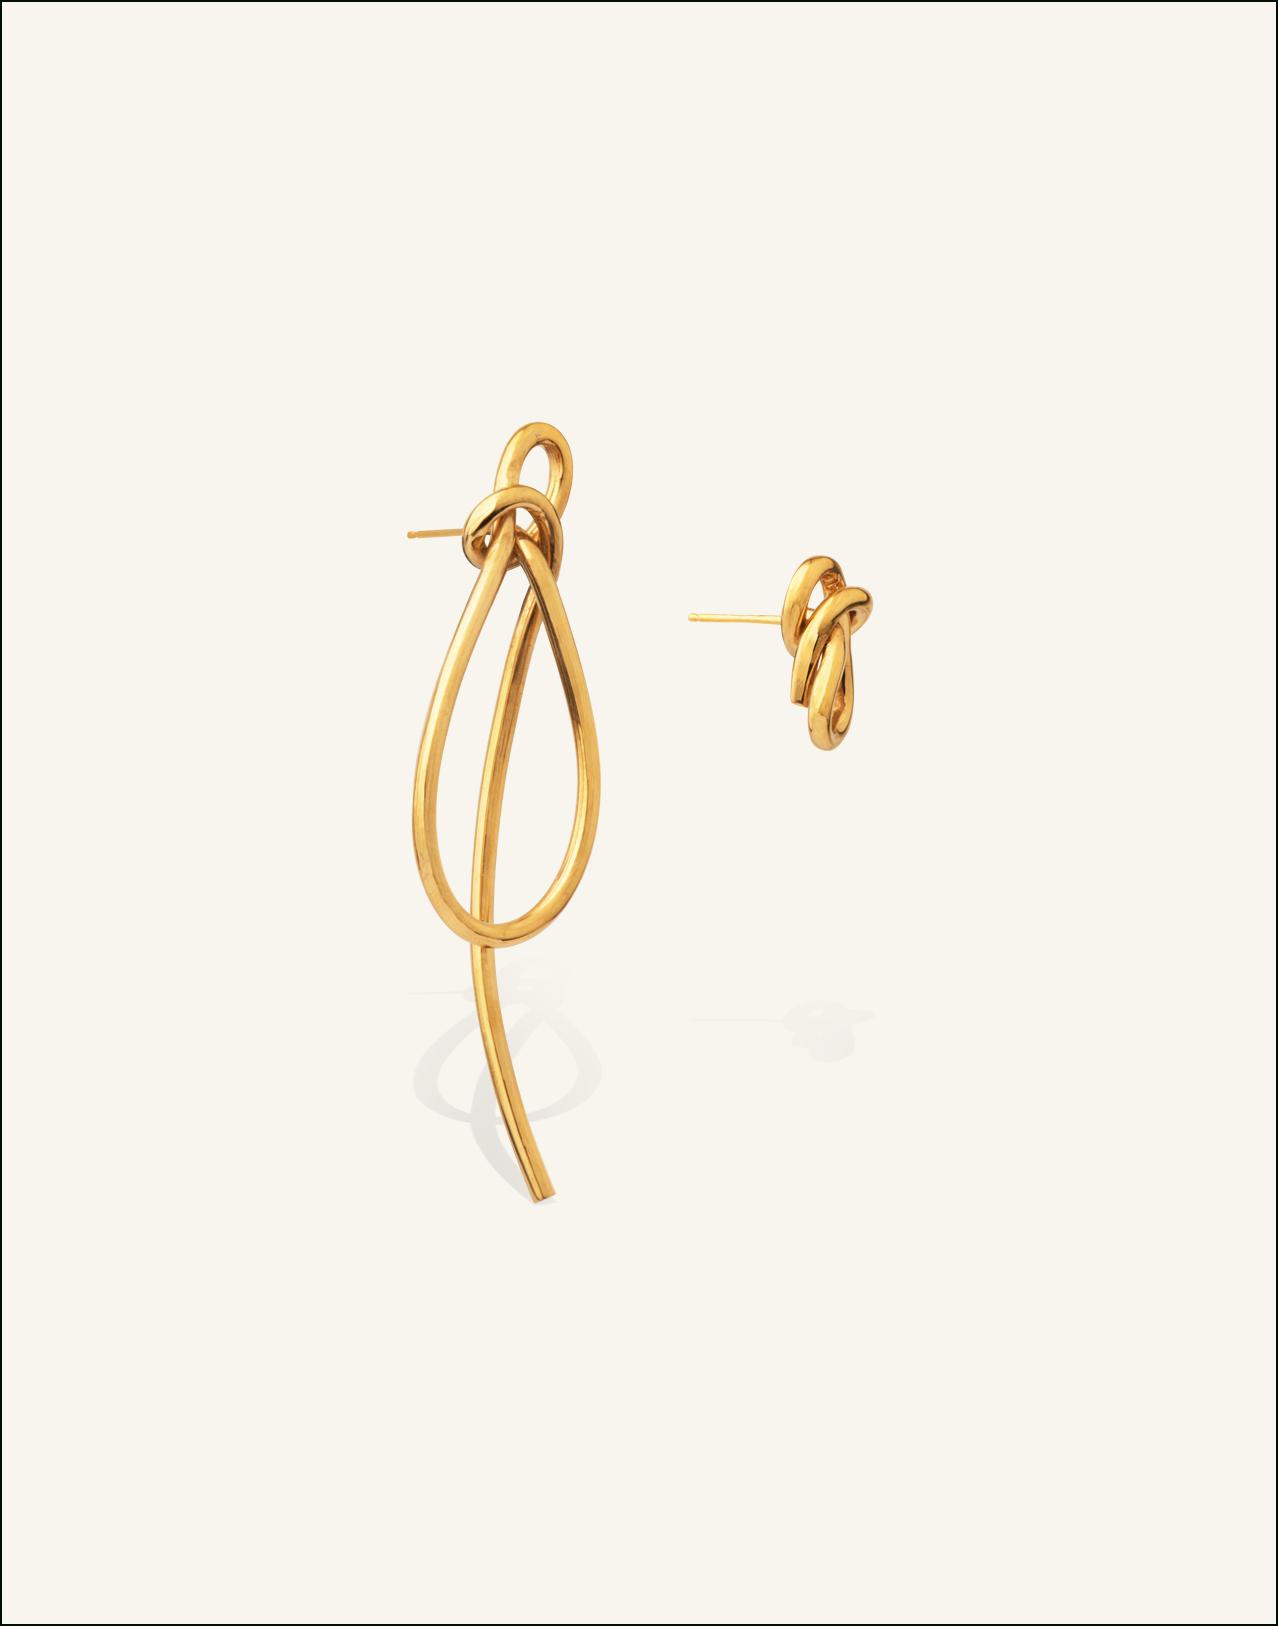 Completedworks-Earrings-The-Bird-2-1.jpg